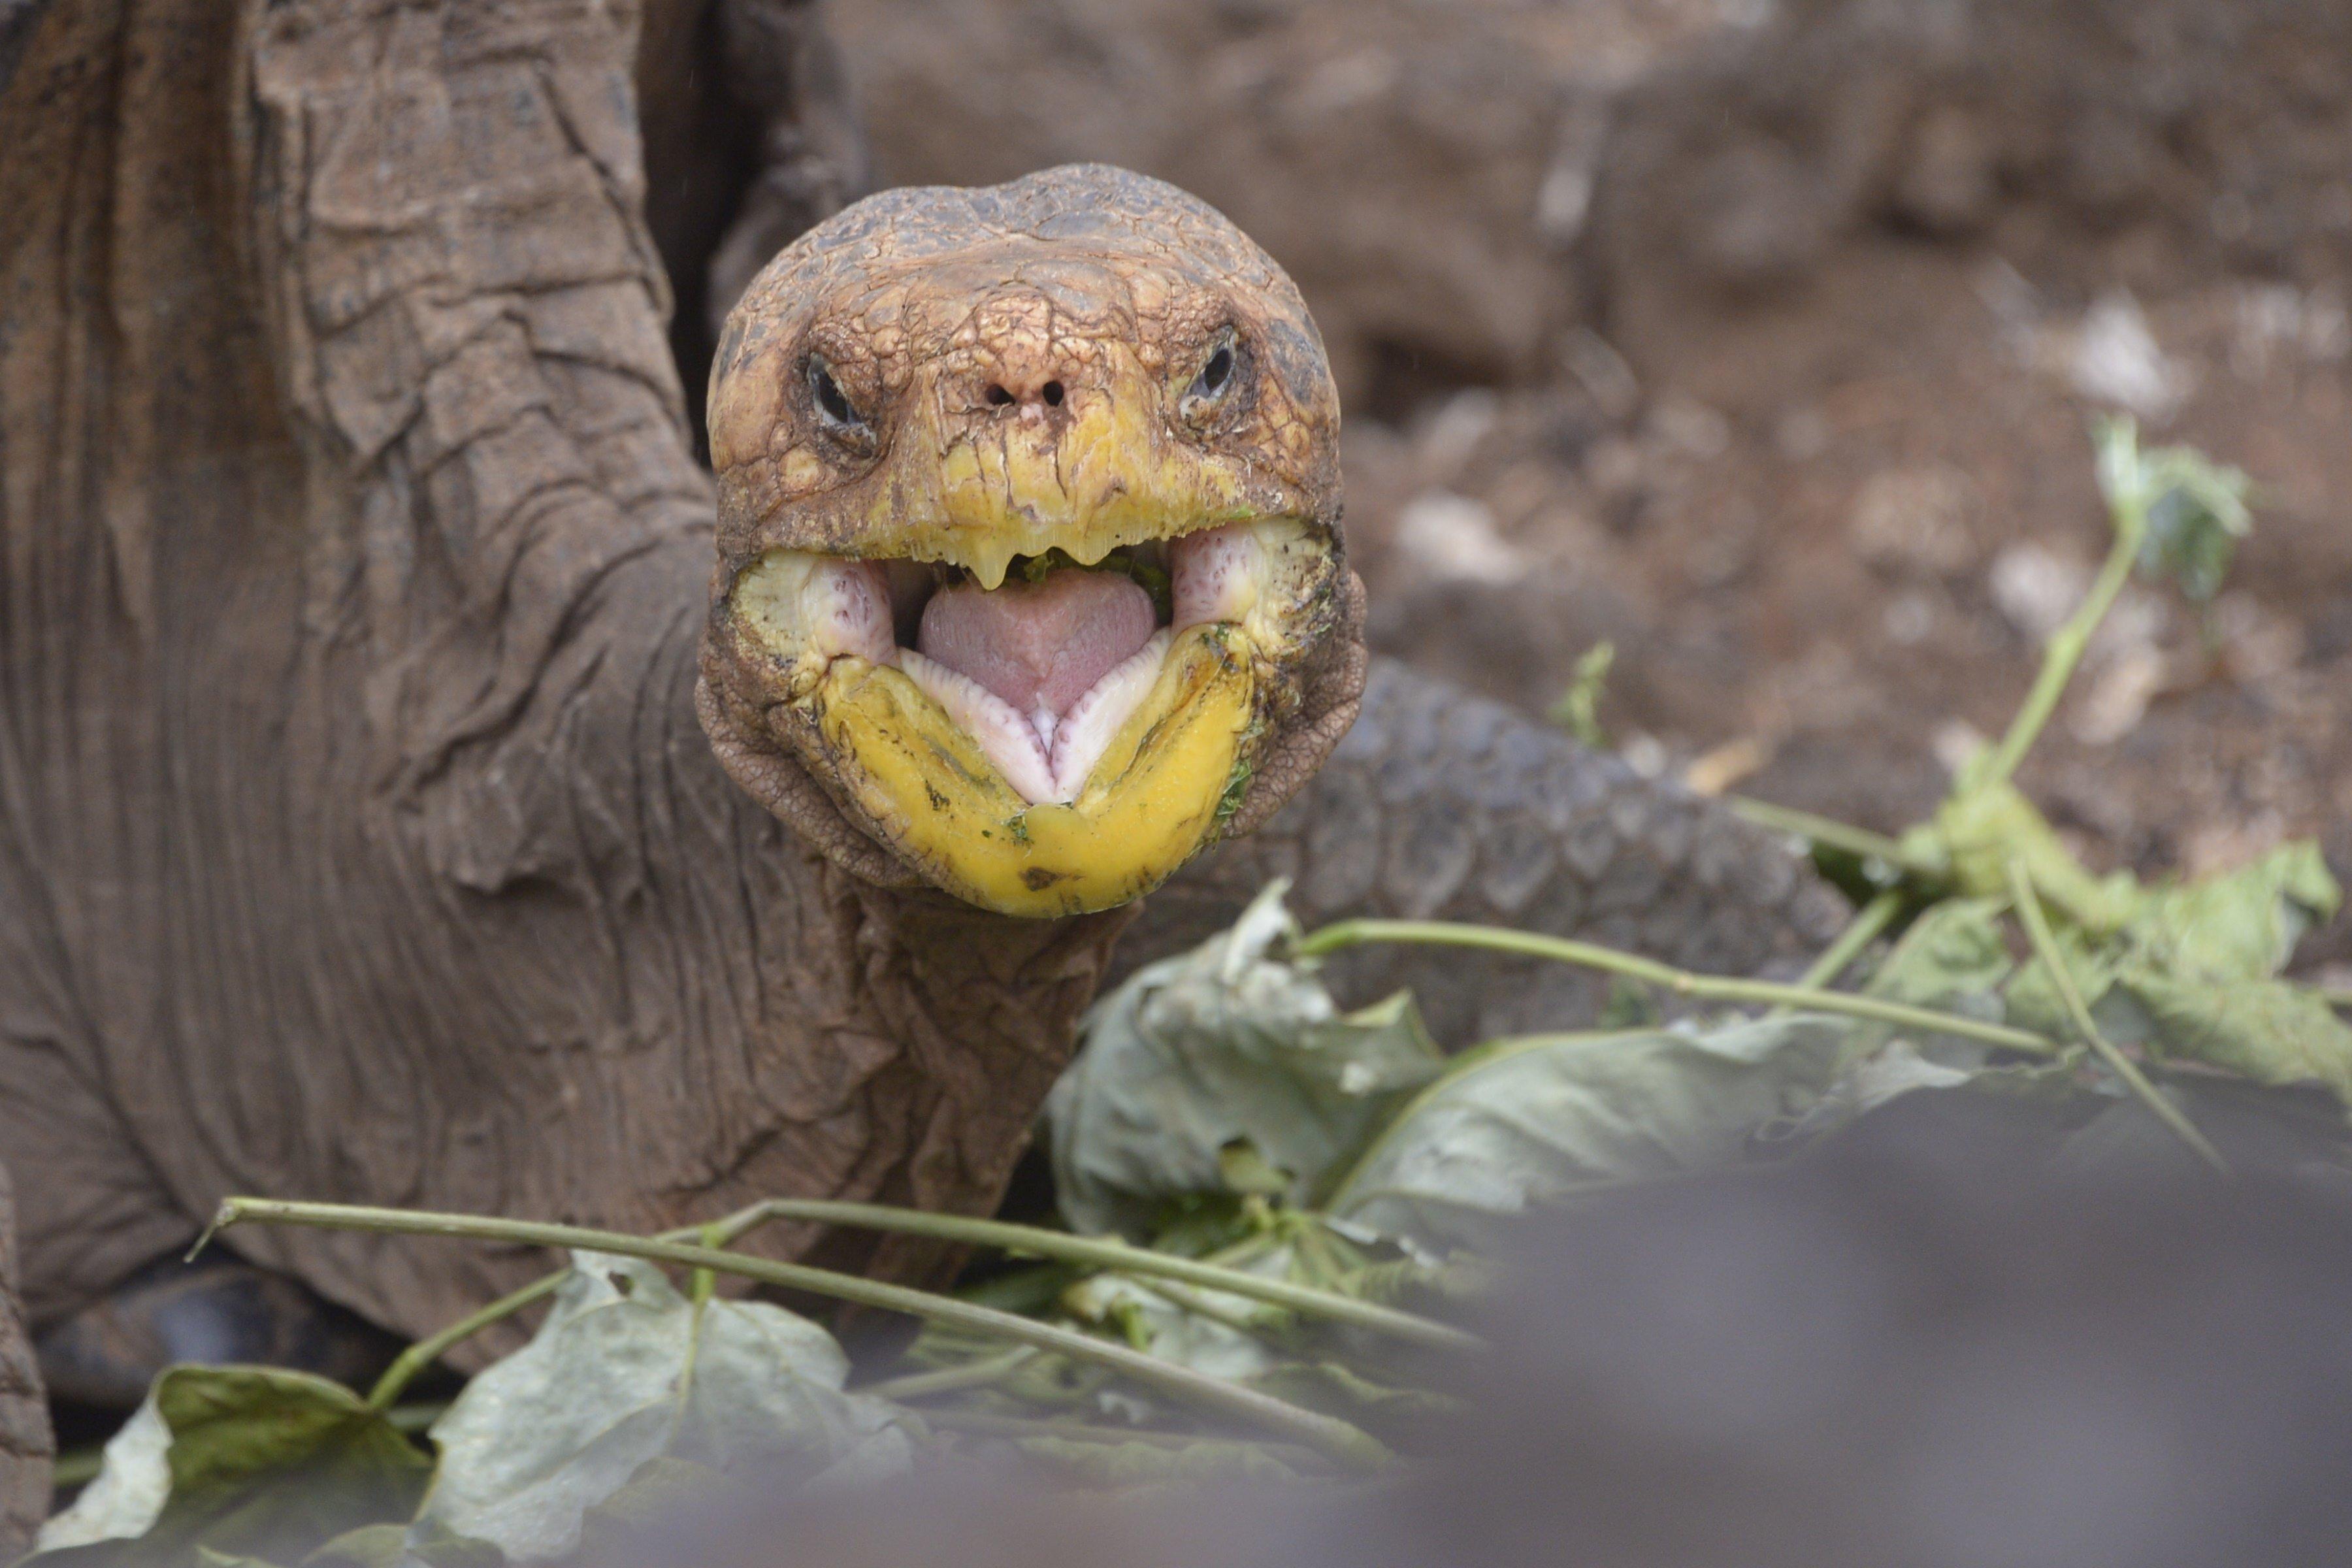 100-Year-Old Tortoise Sex God Retires After Making 800 Species-Saving Babies